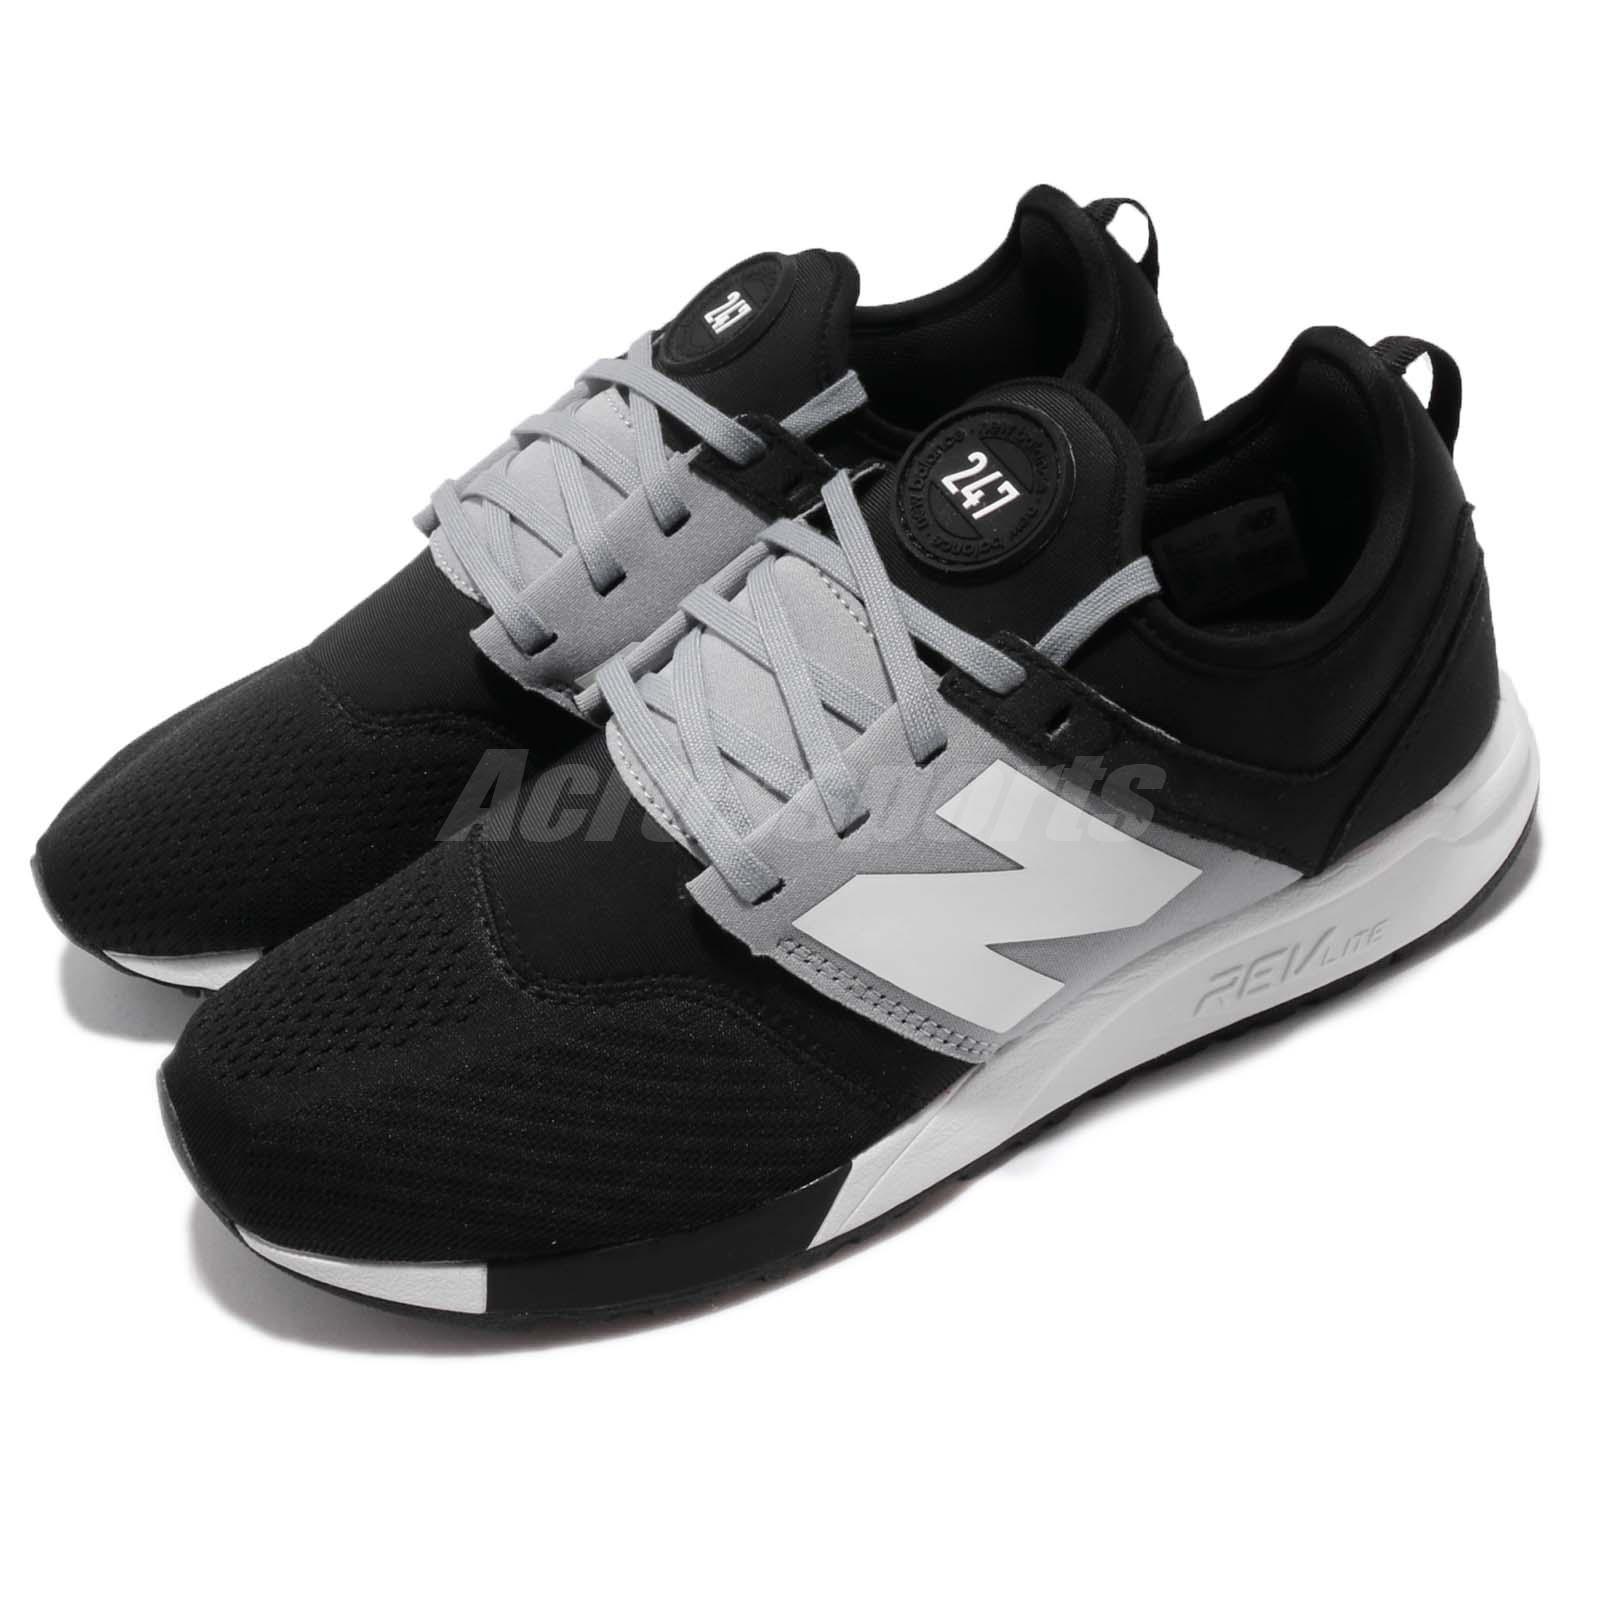 7e7ff4d40b083 Details about New Balance MRL247TD D Black Grey White Men Running Shoes  Sneakers MRL247TDD